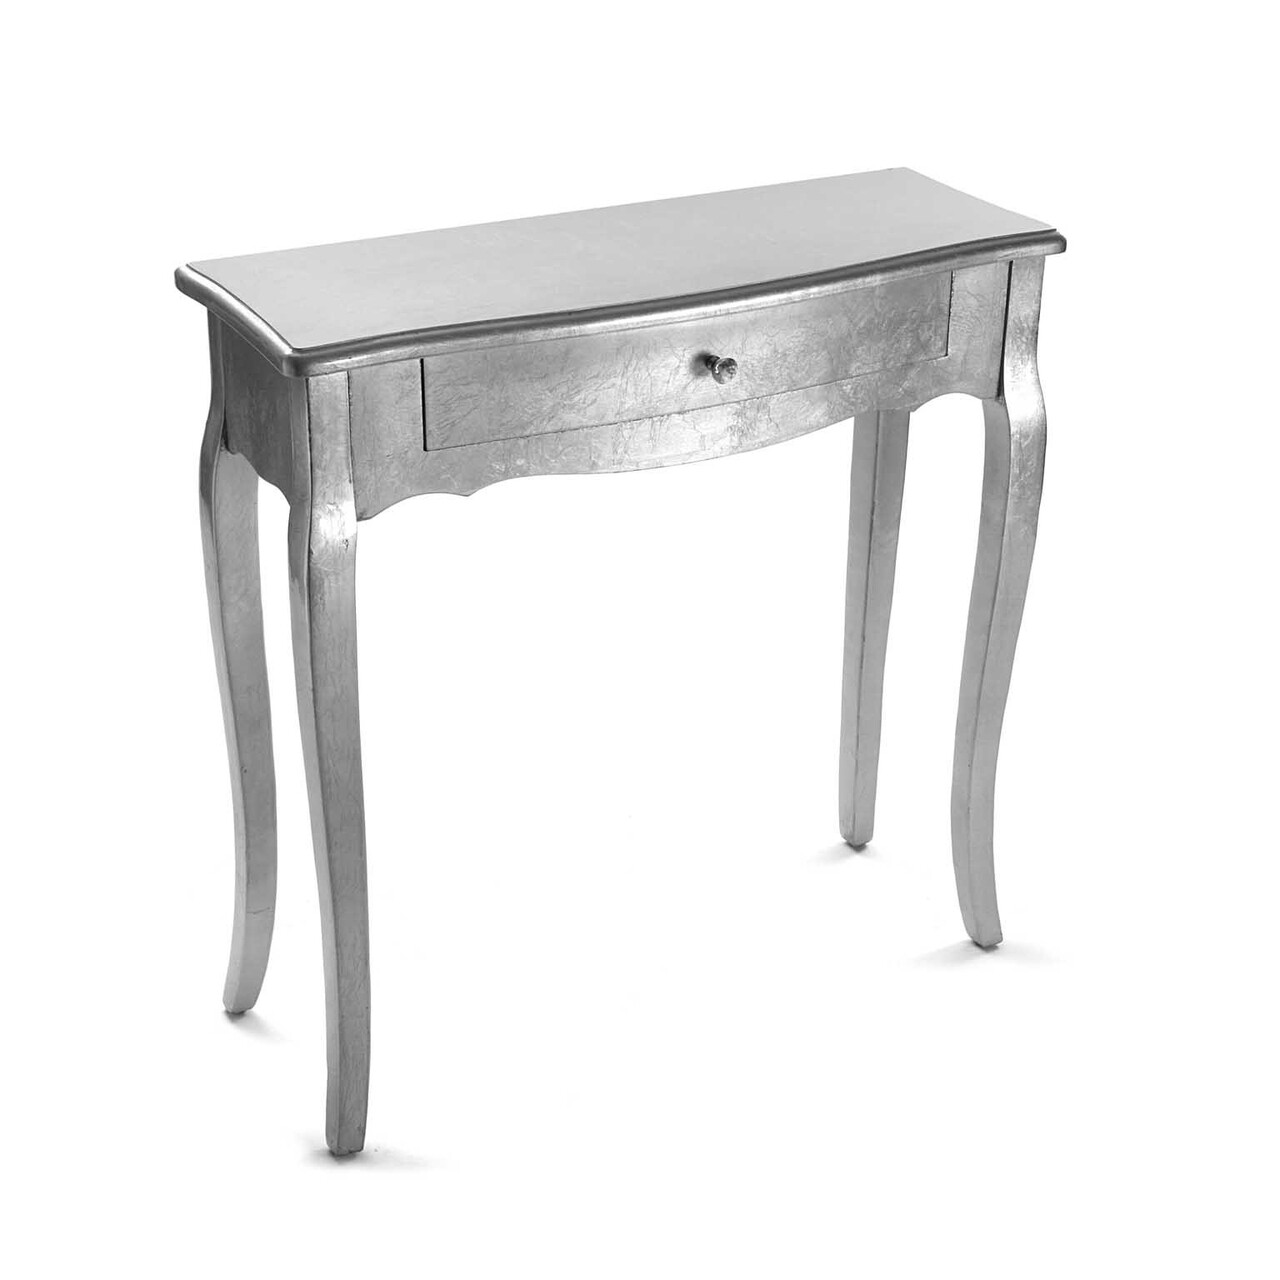 Consola cu 1 sertar Cagliari Silver, Versa, 80x30x80 cm, lemn de brad